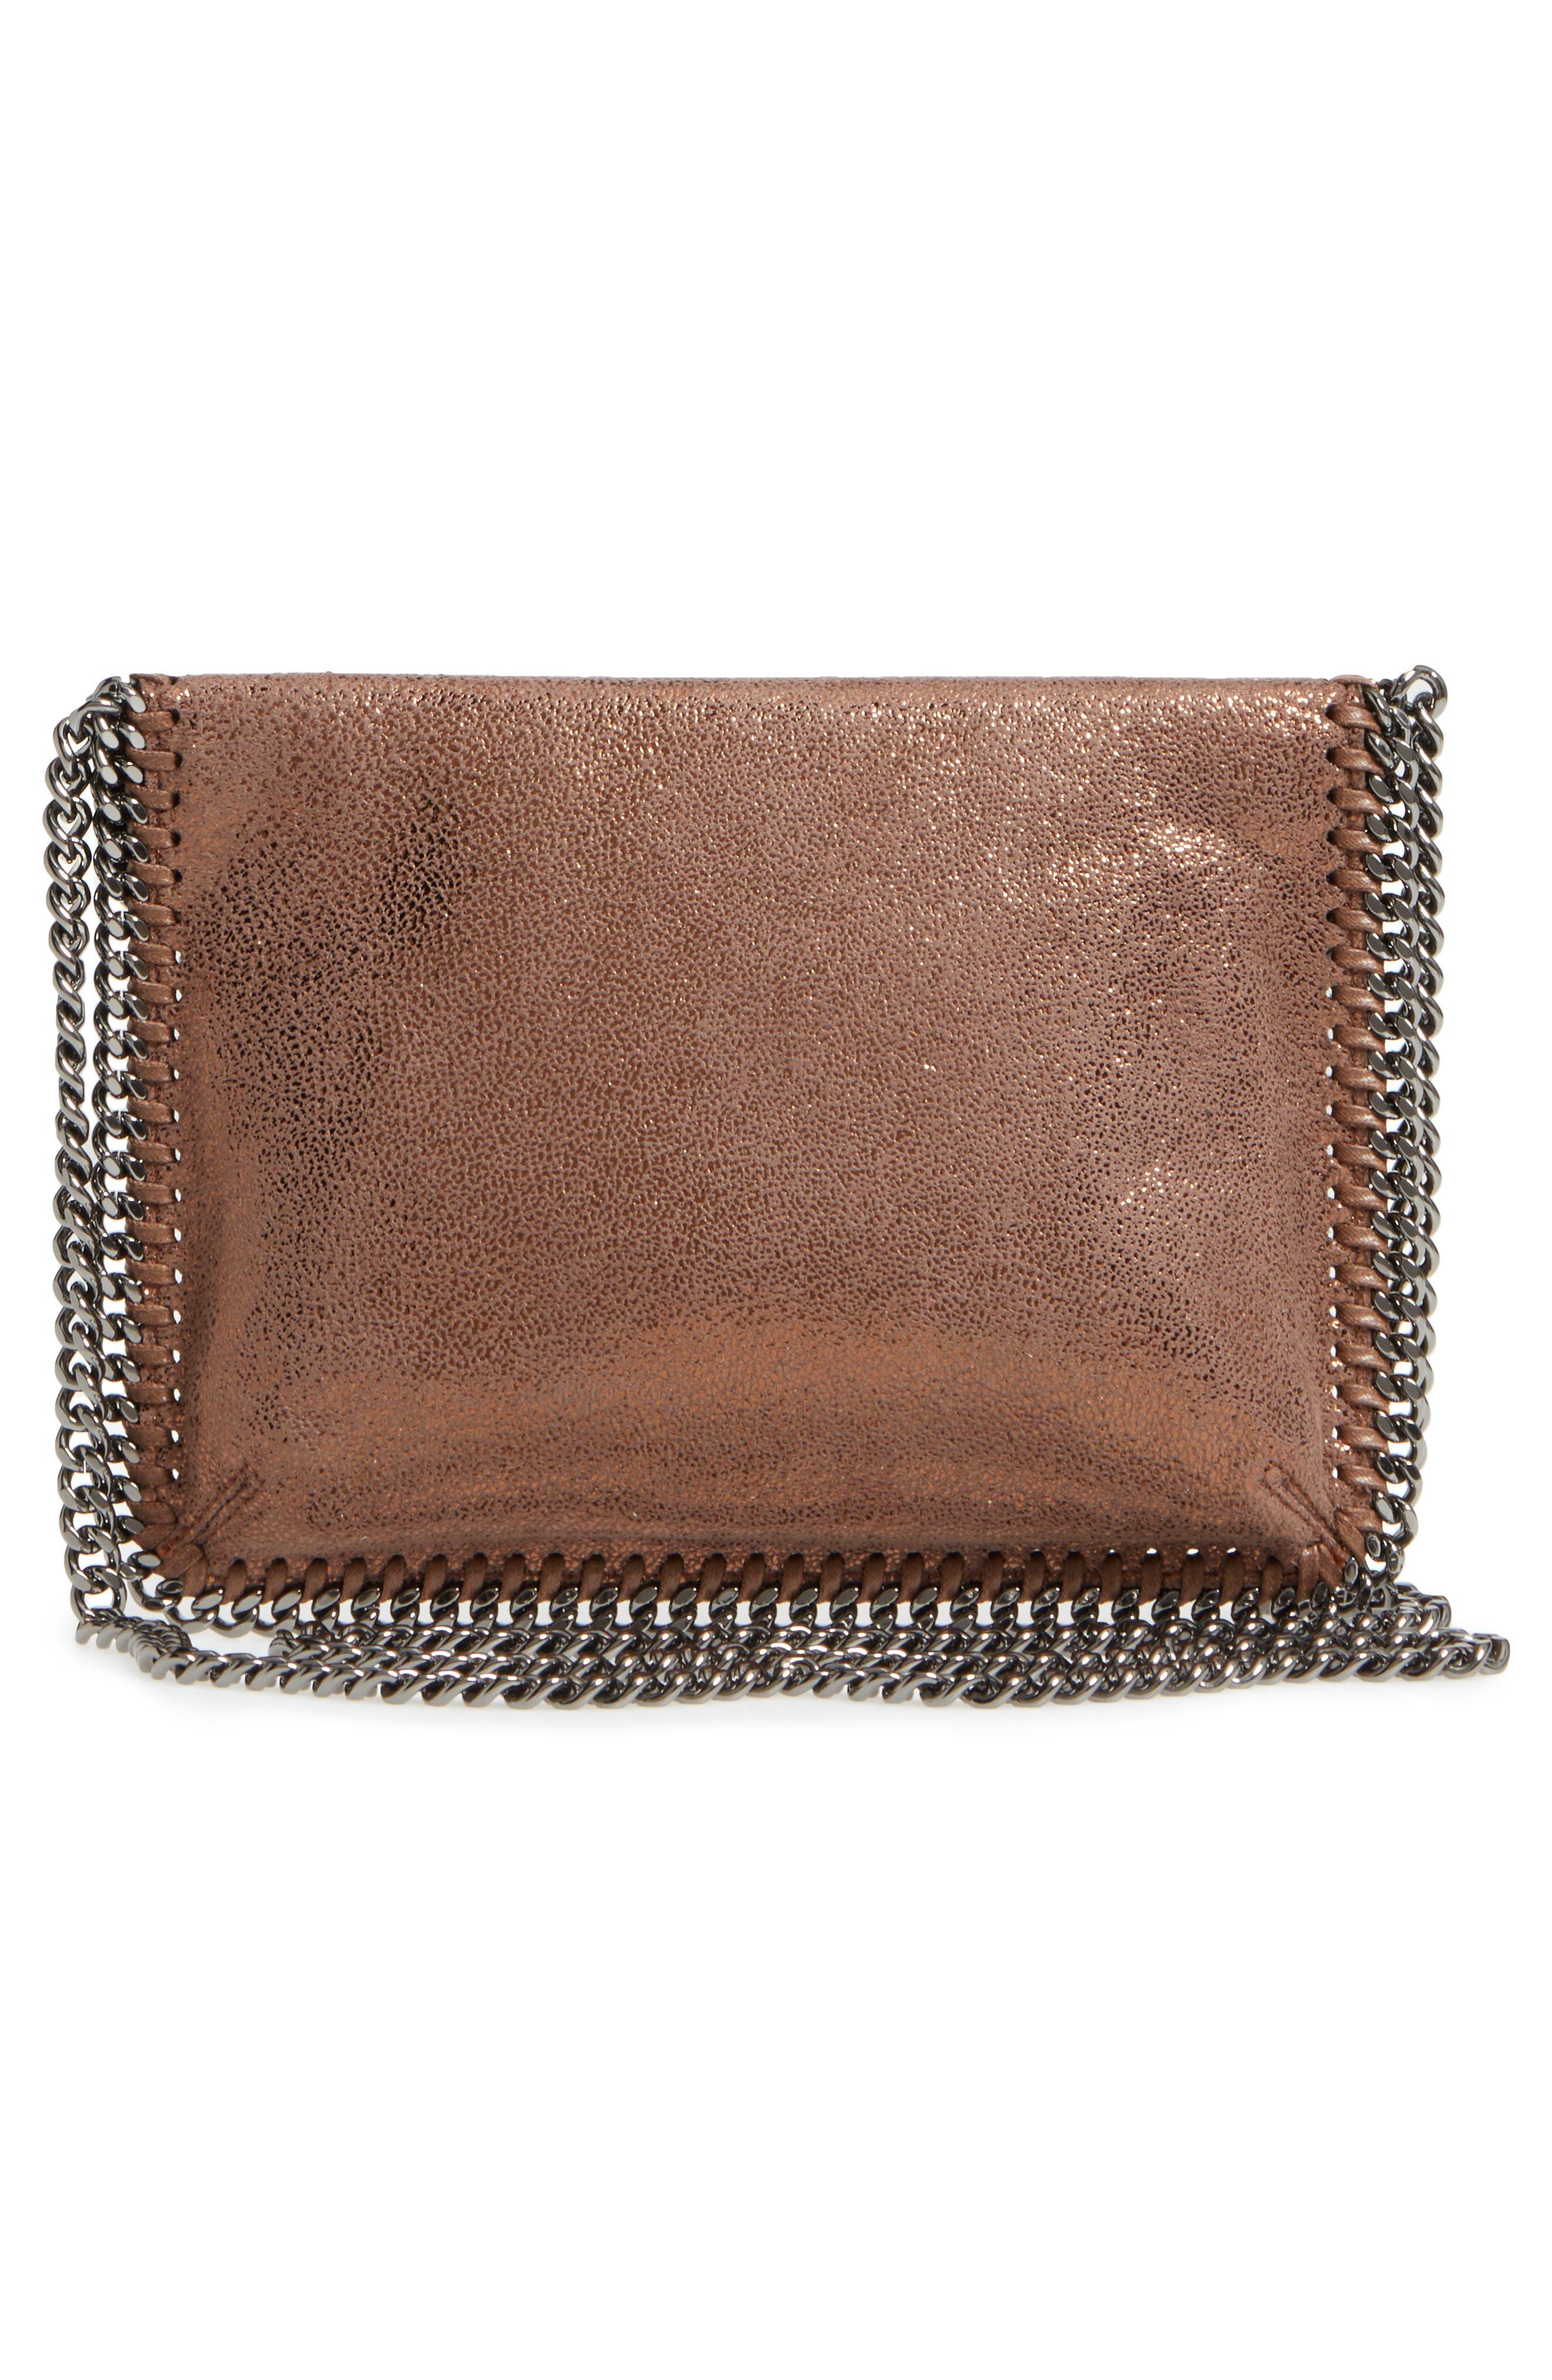 Metallic Faux Leather Crossbody Bag,                             Alternate thumbnail 3, color,                             200